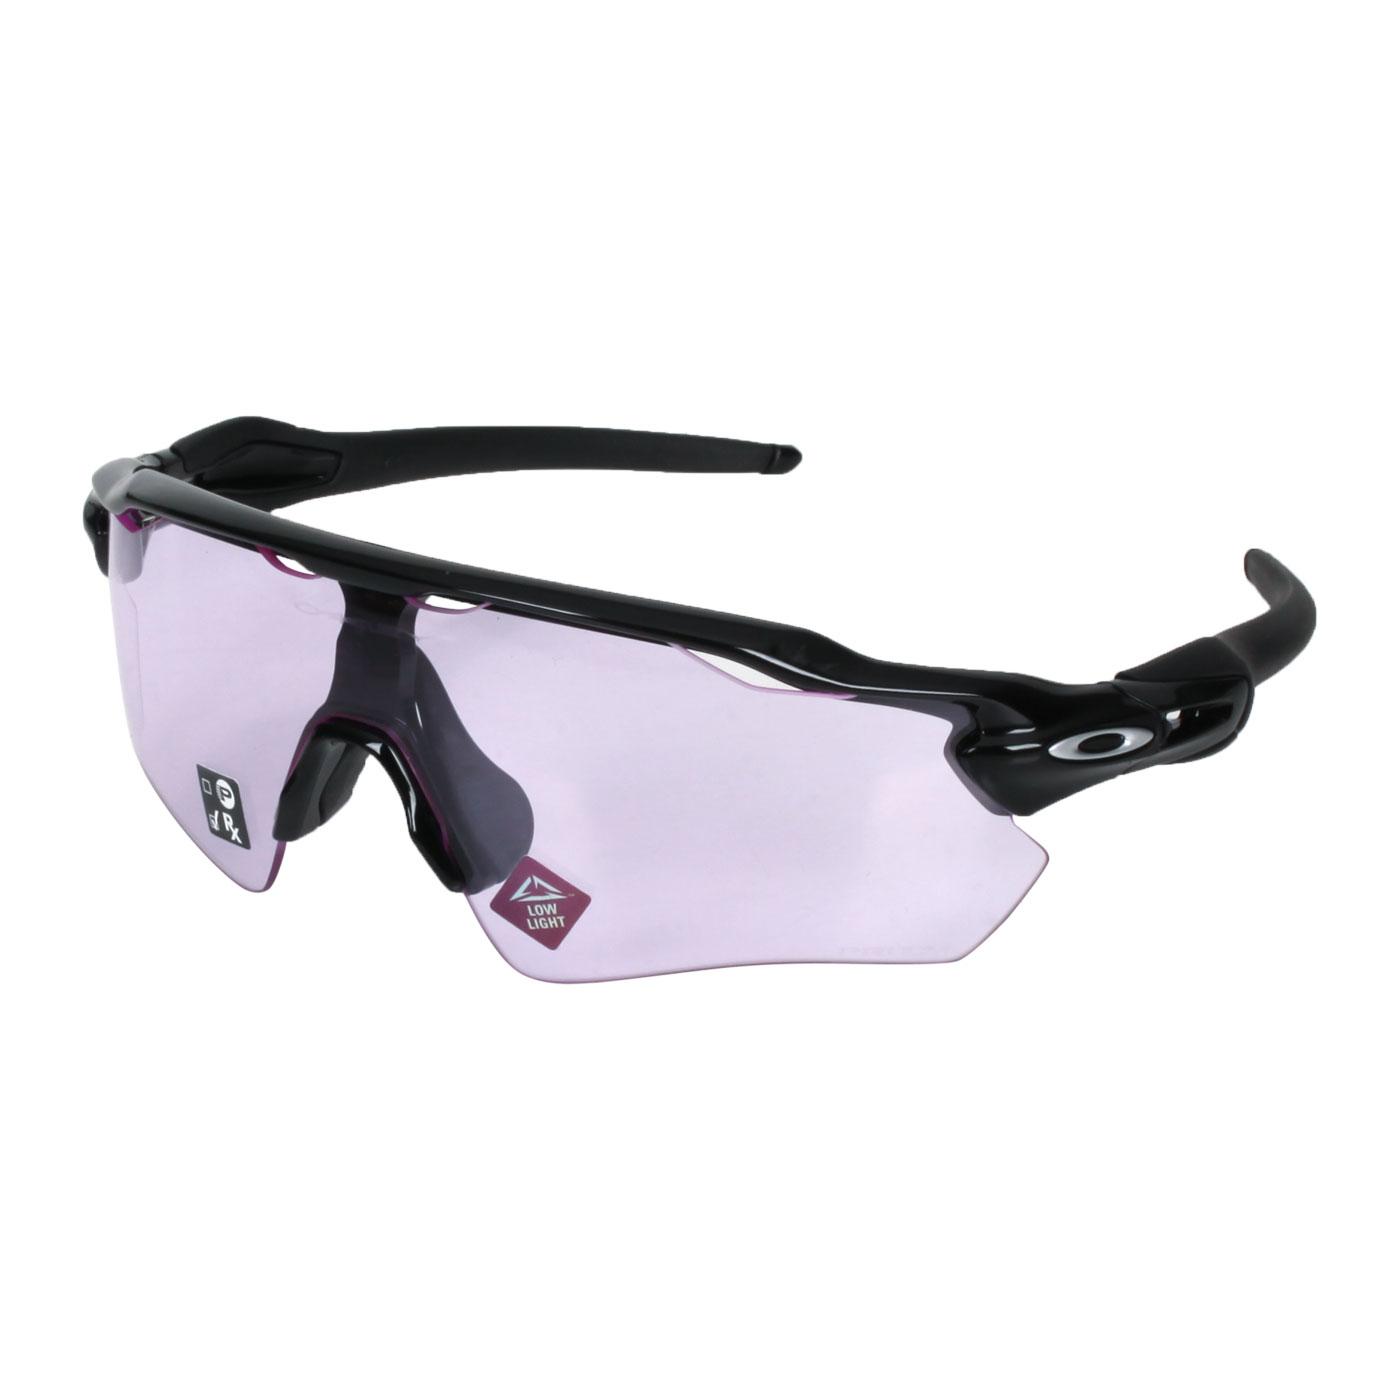 OAKLEY RADAR EV PATH 一般太陽眼鏡(附硬盒鼻墊) OAK-OO9208-9838